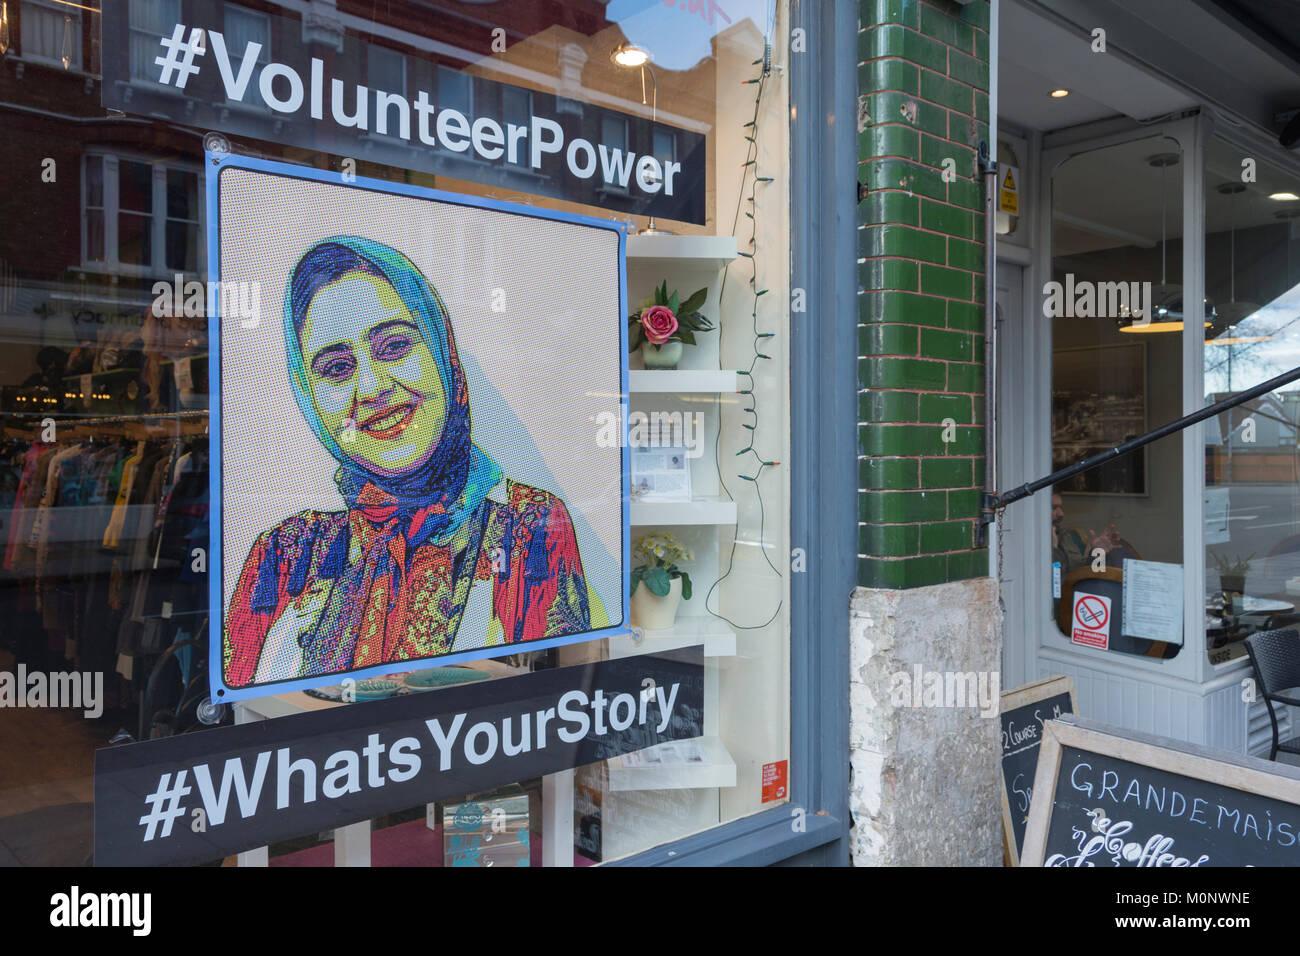 Volunteer Workforce Stock Photos & Volunteer Workforce Stock Images ...